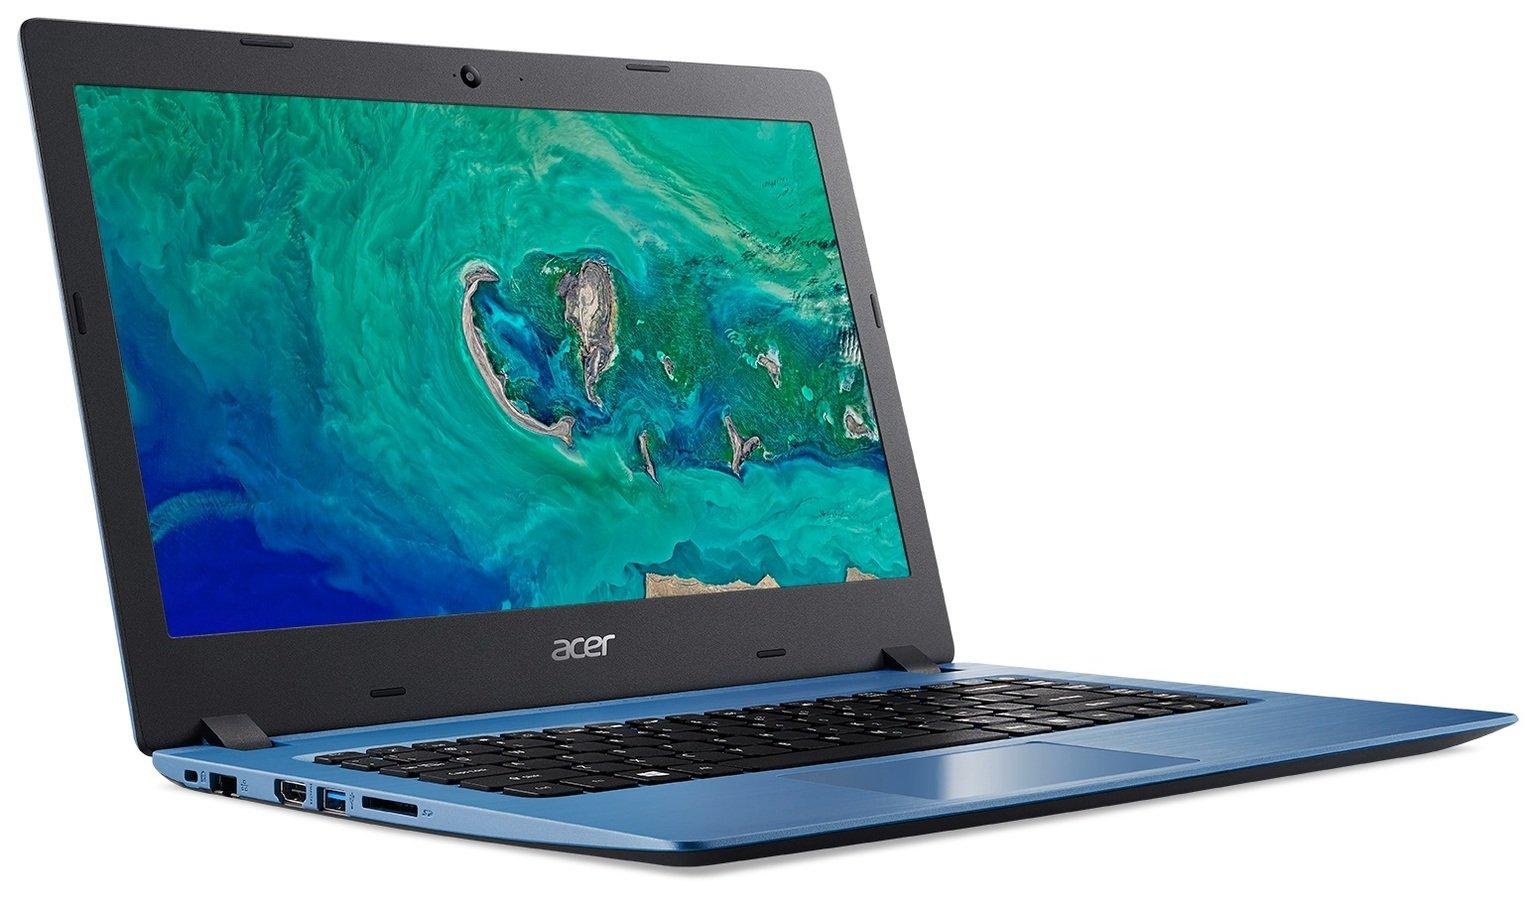 Acer Aspire 1 14 Inch Celeron 4GB 64GB Cloudbook - Blue